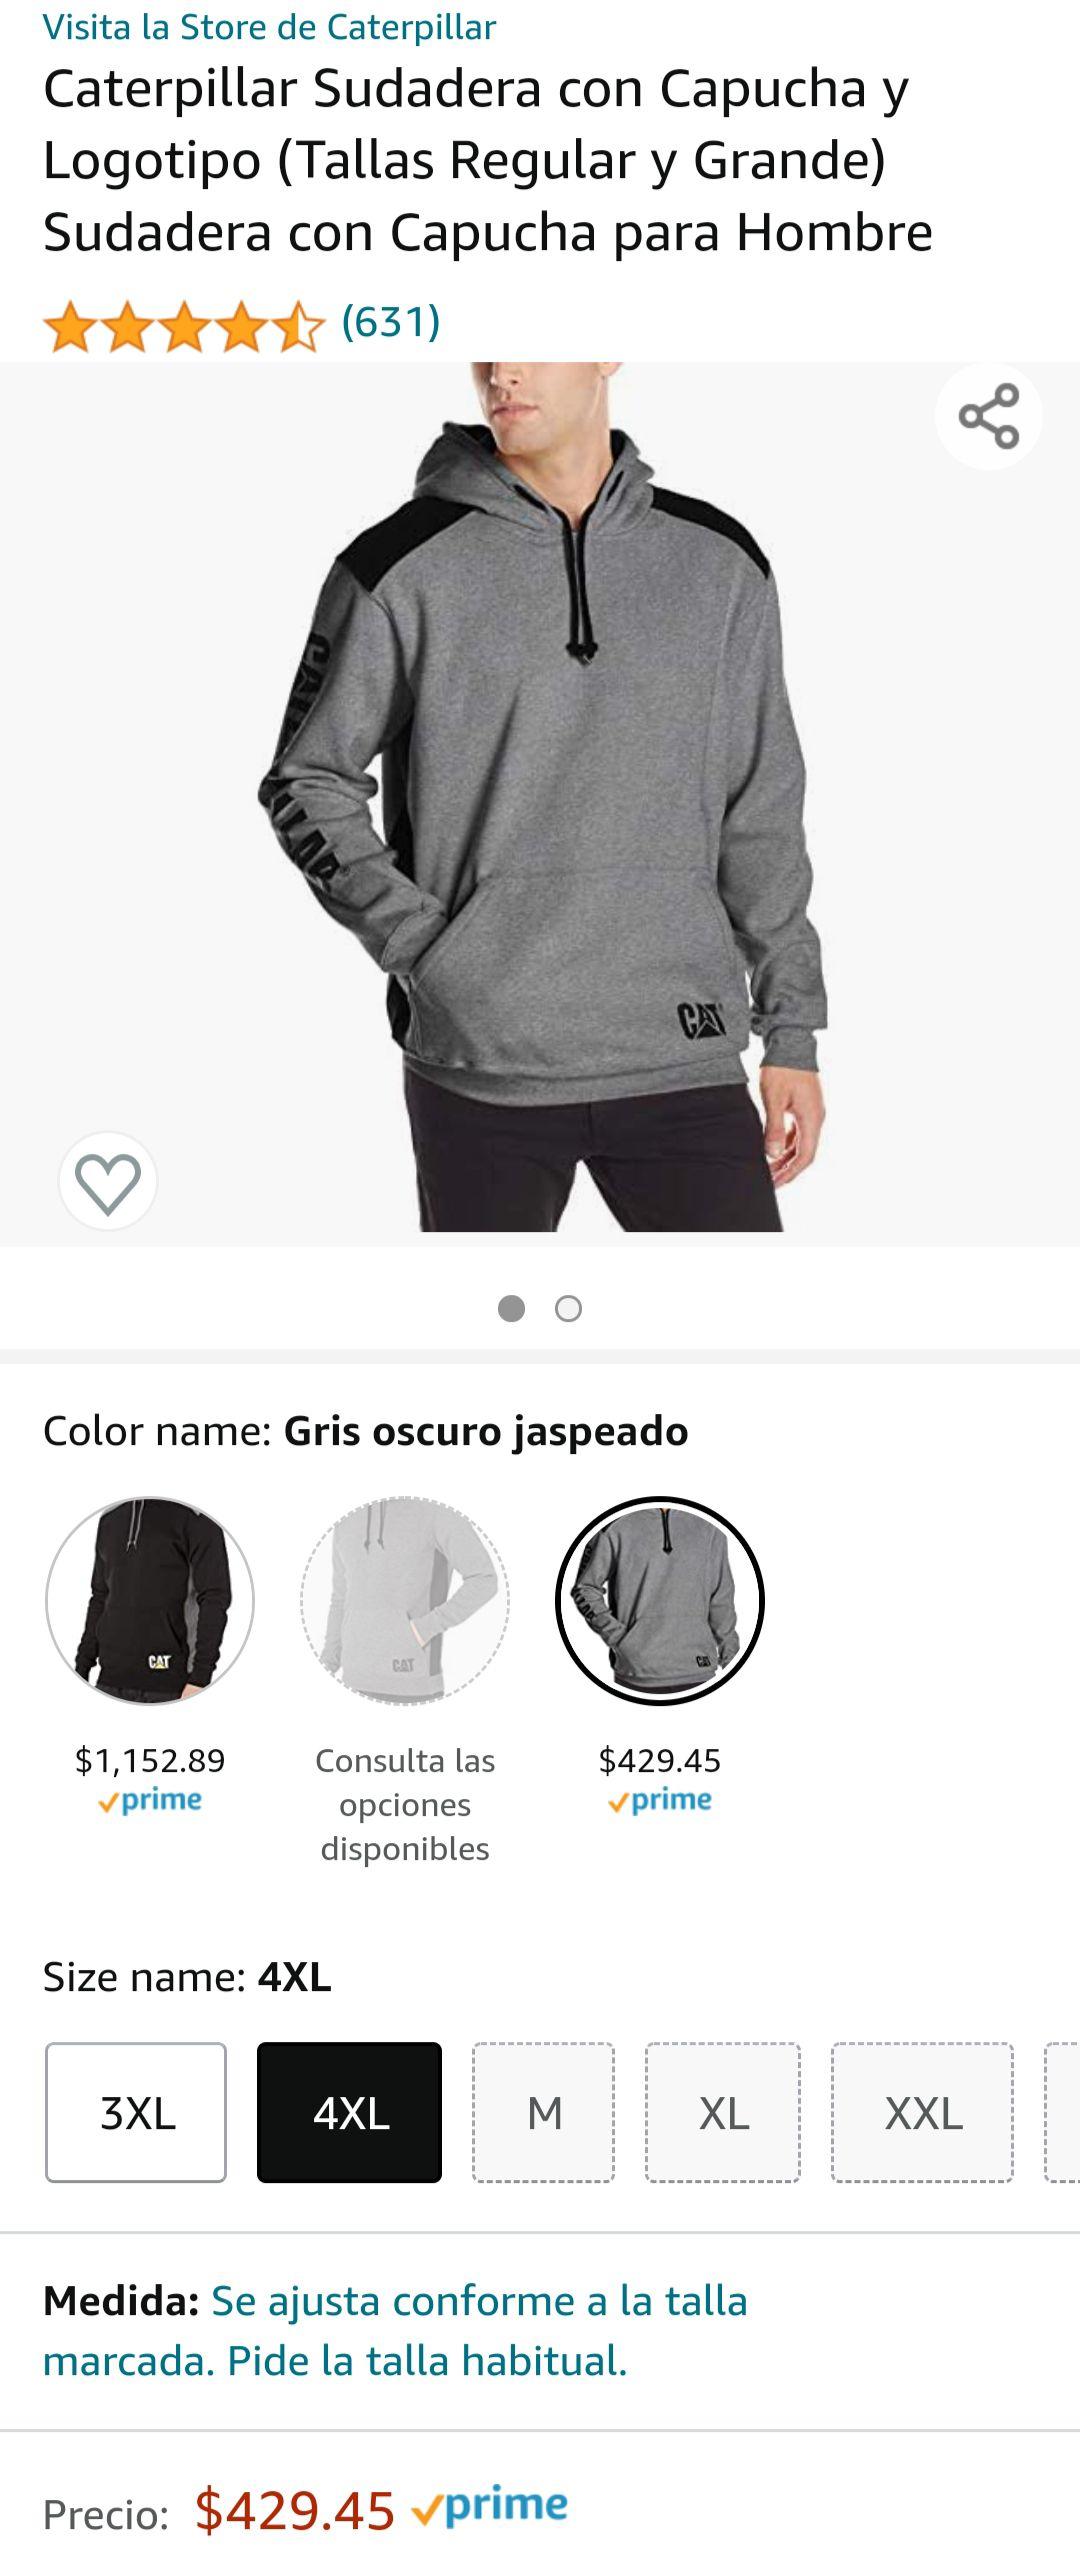 Amazon: Caterpillar Sudadera con Capucha y Logotipo para Hombre (talla 4XL gris) envío gratis con Prime